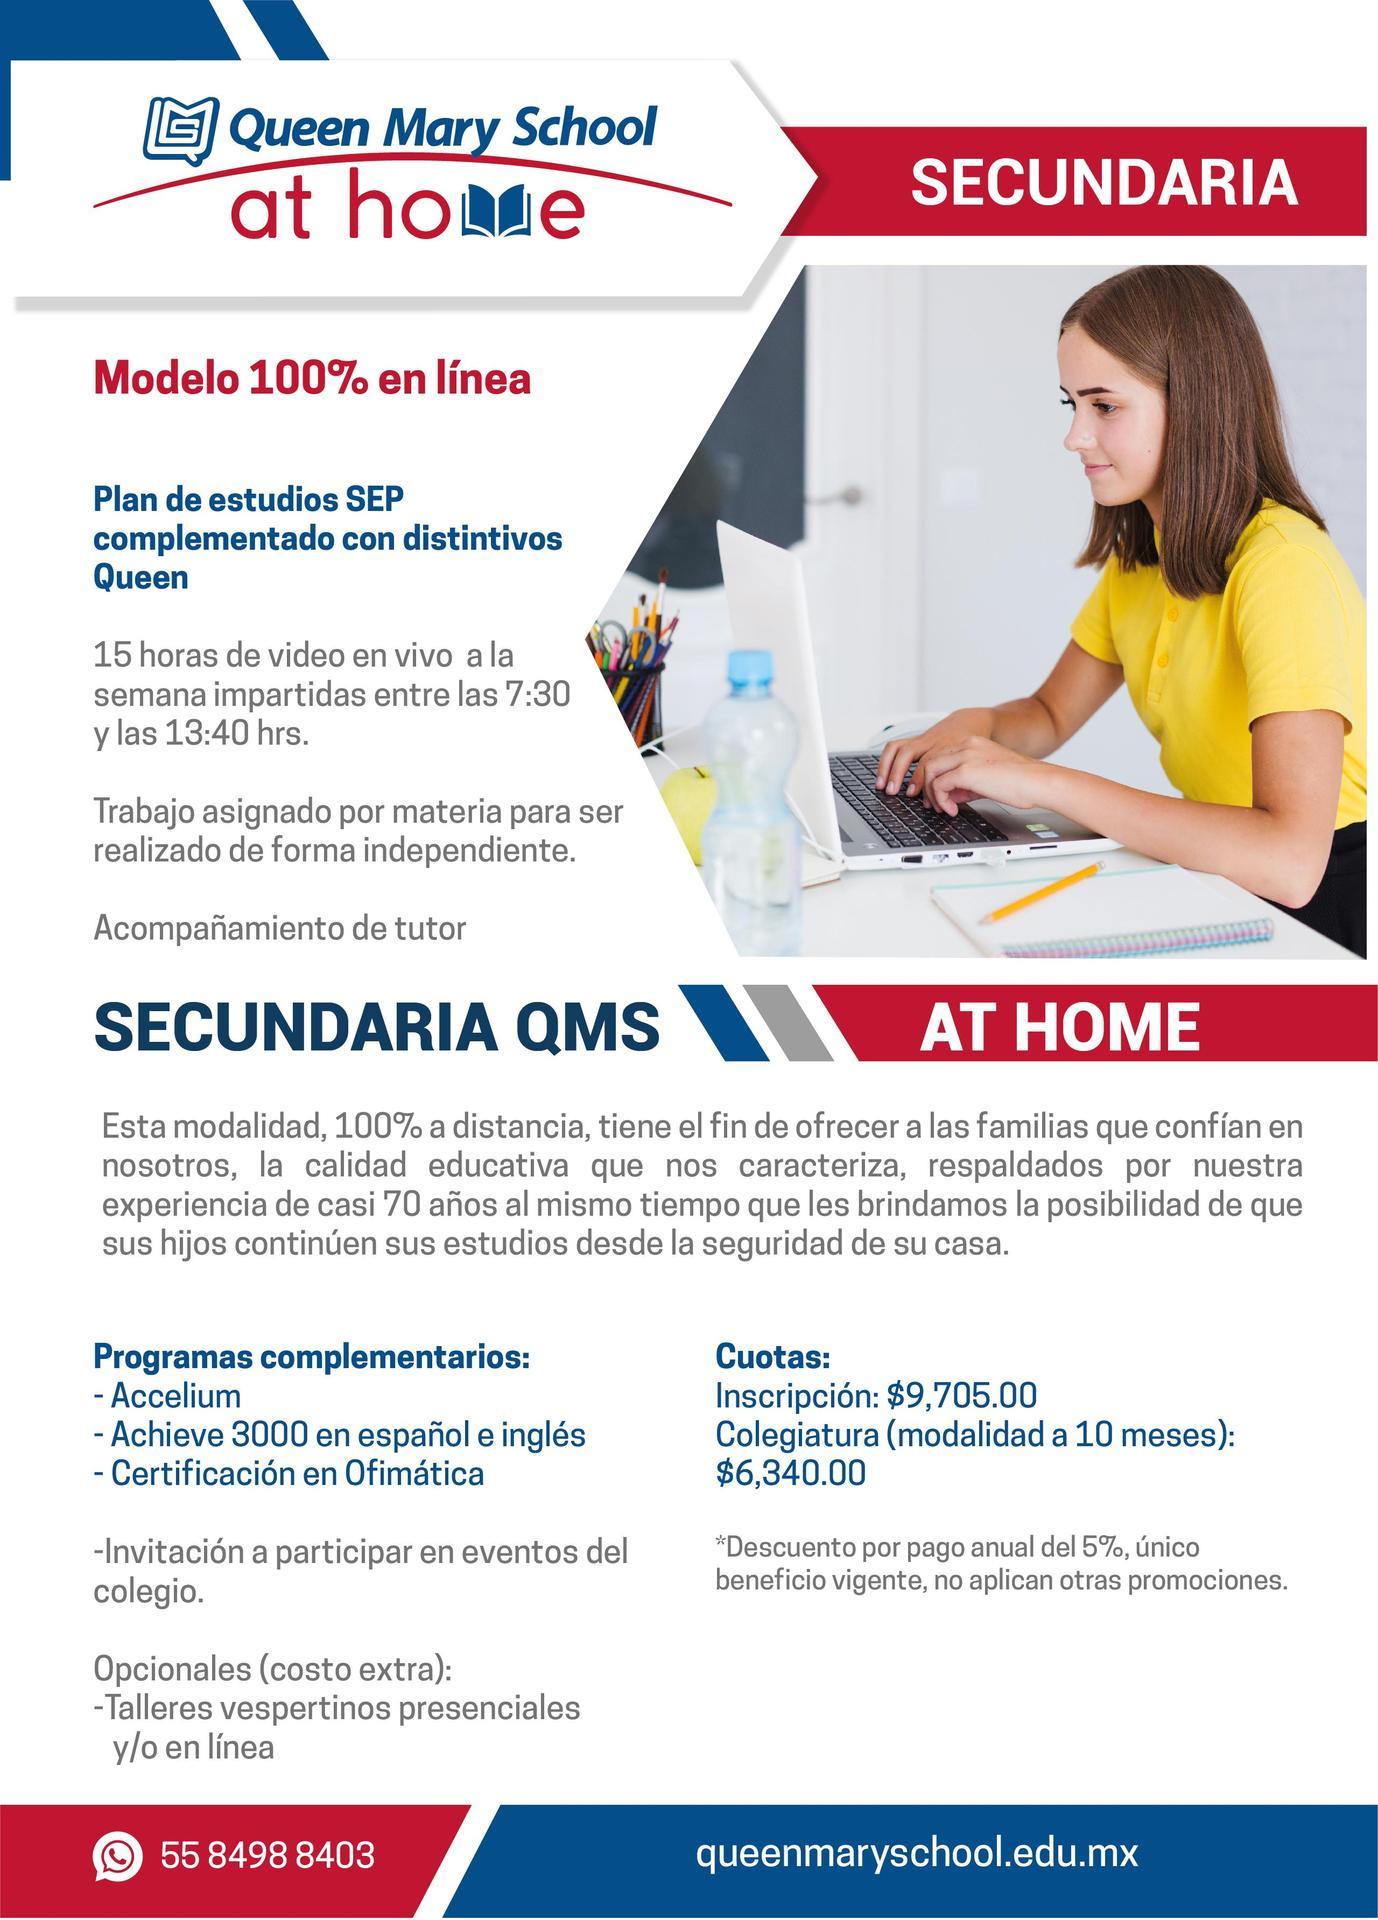 Secundaria at home